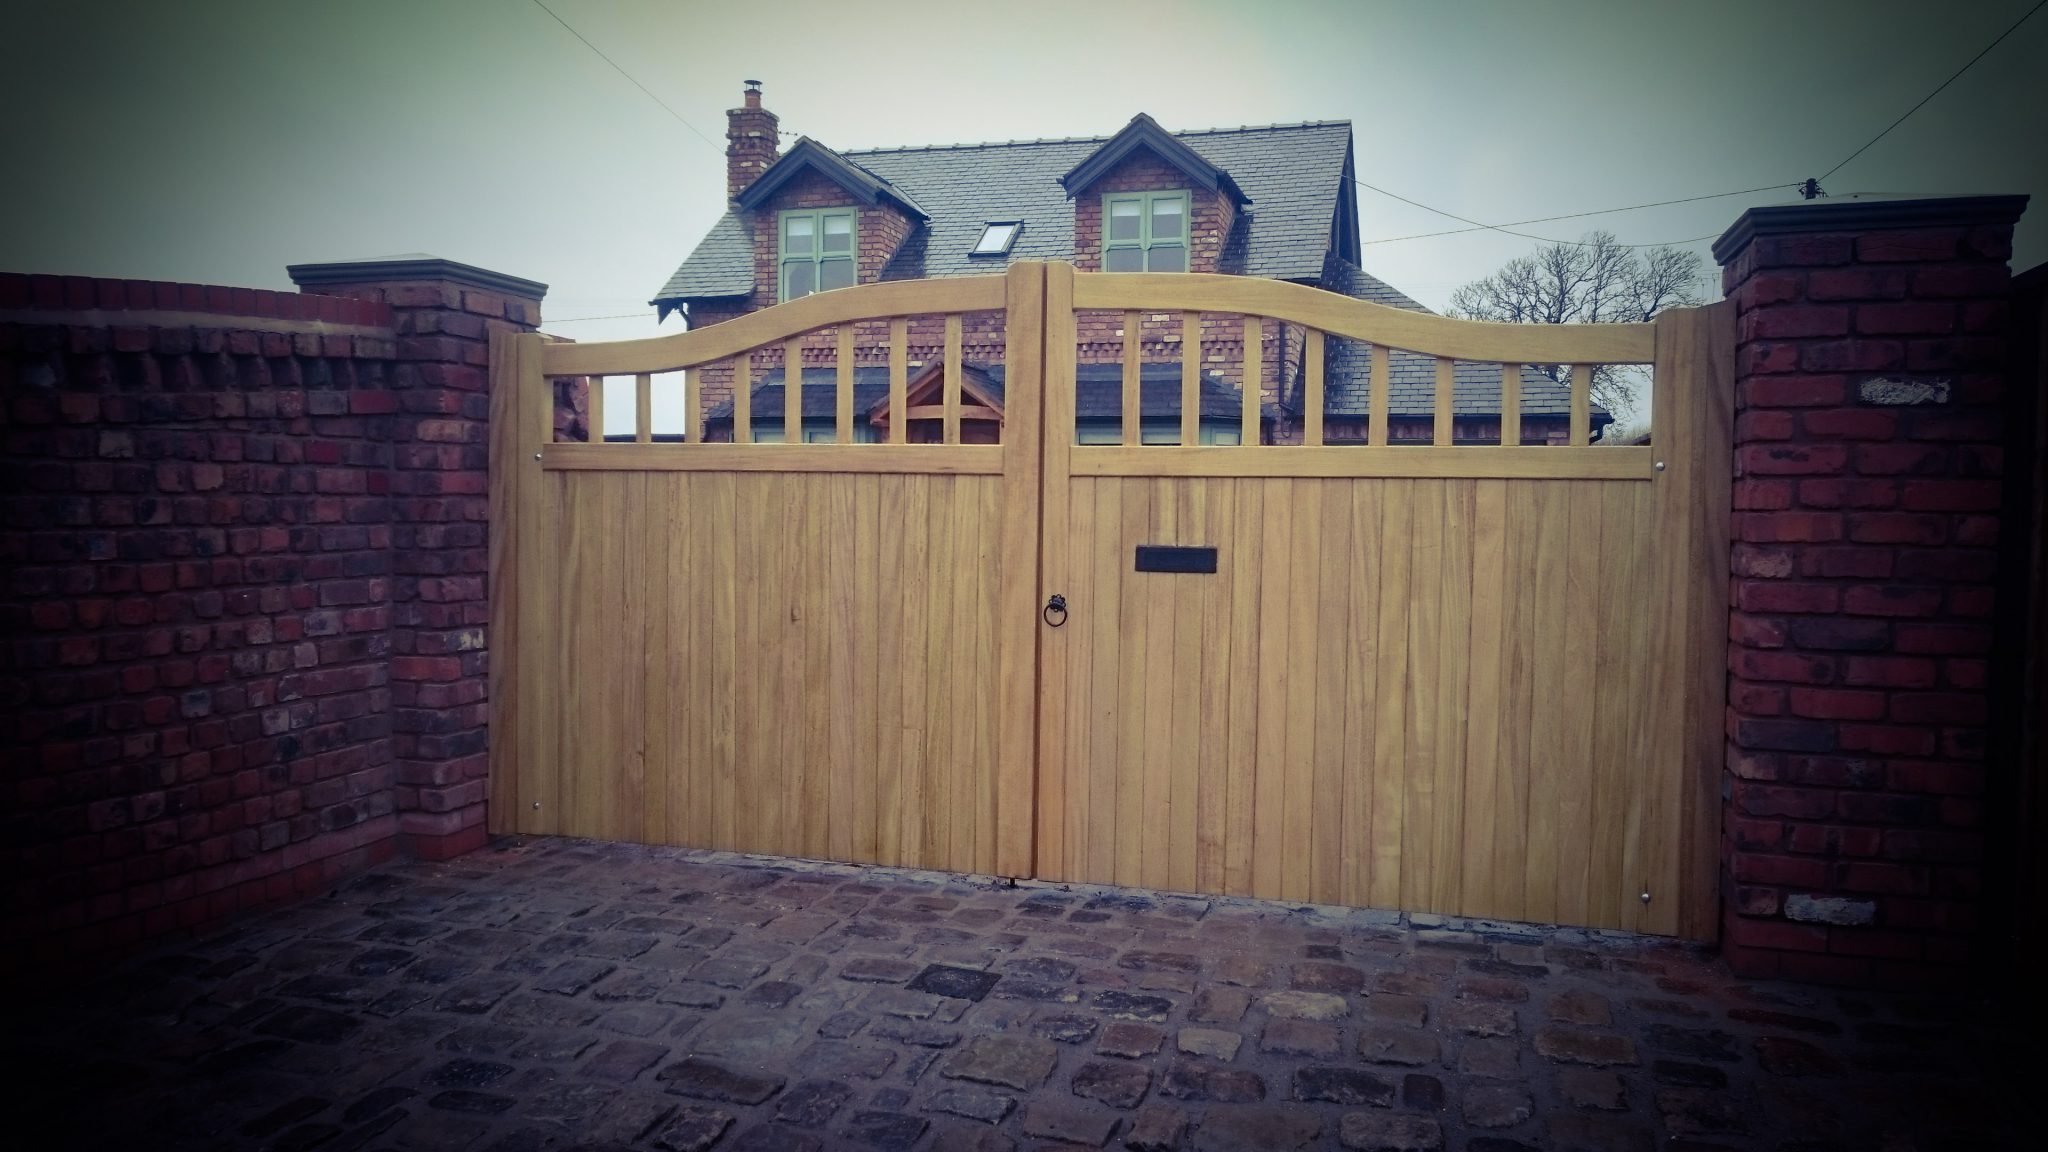 Idigbo Hardwood Chester Design Driveway Gates